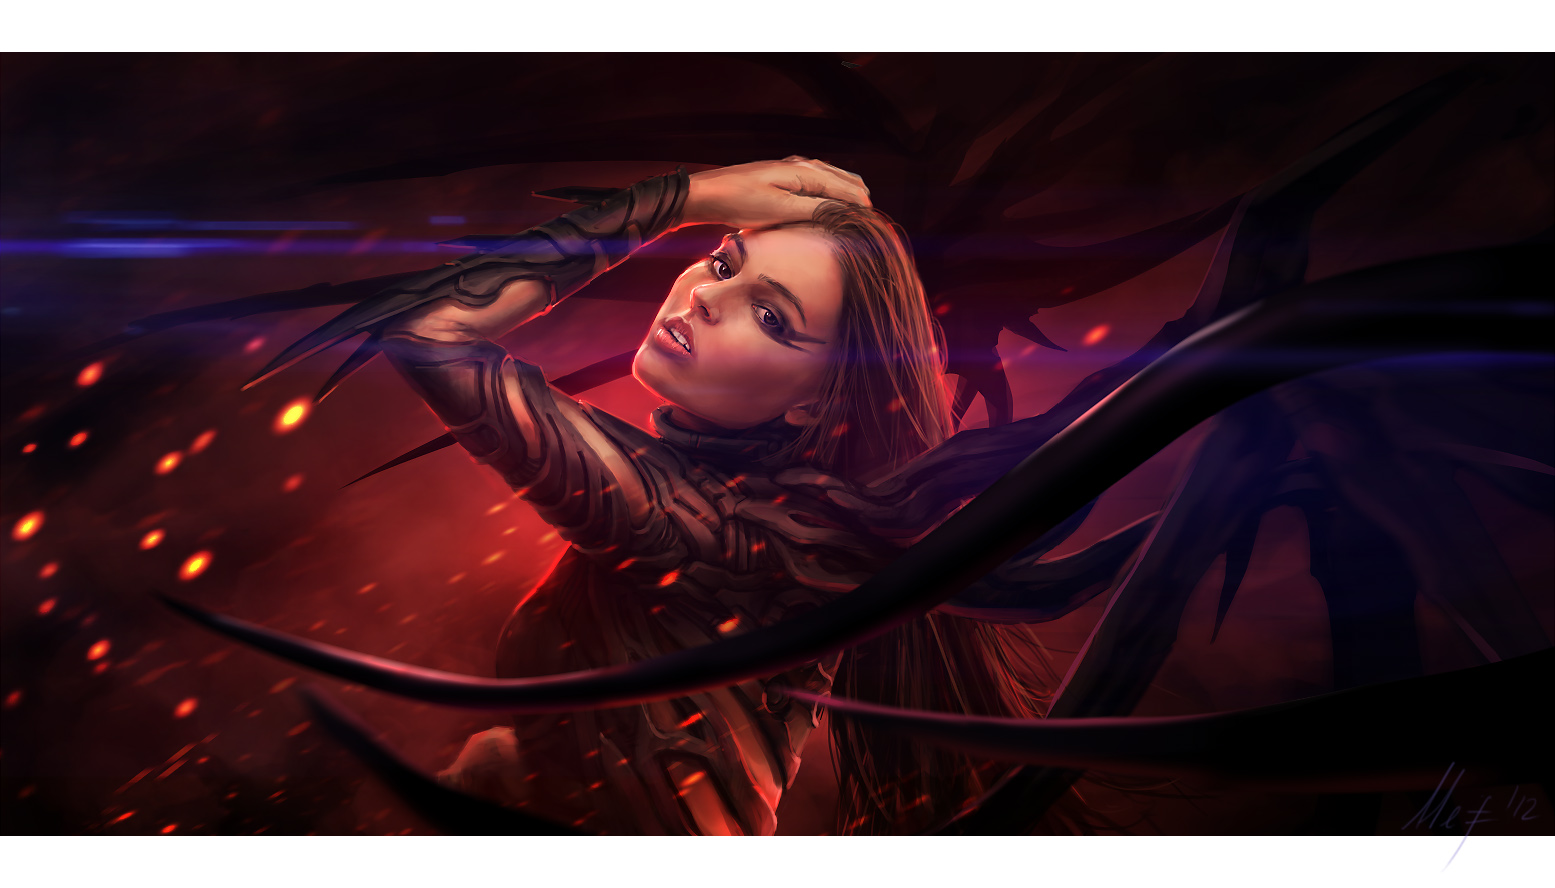 Black Black Heart by ArtistMEF